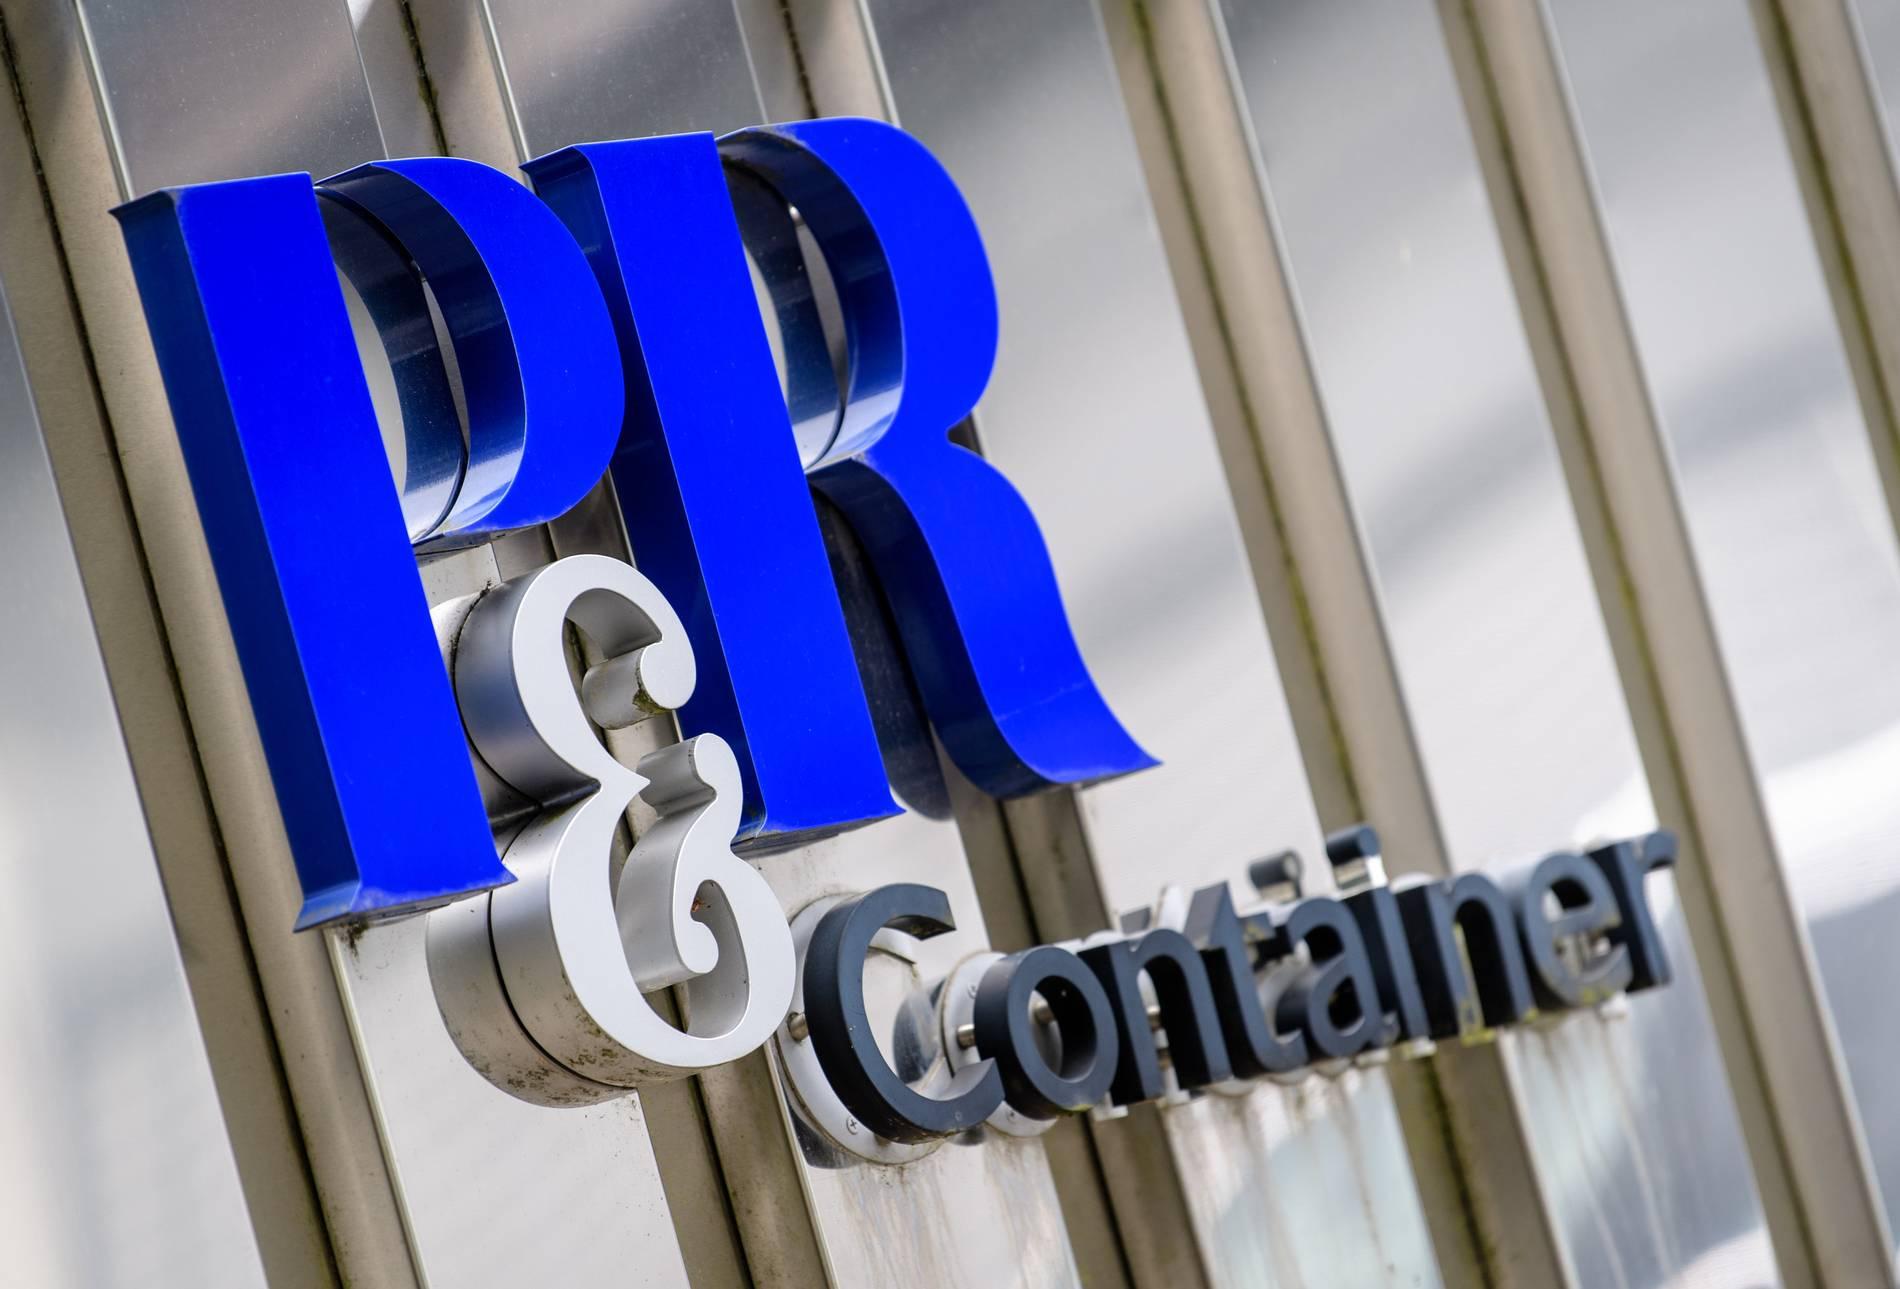 Pr Betrugsskandal Anklage Gegen Firmengründer Roth